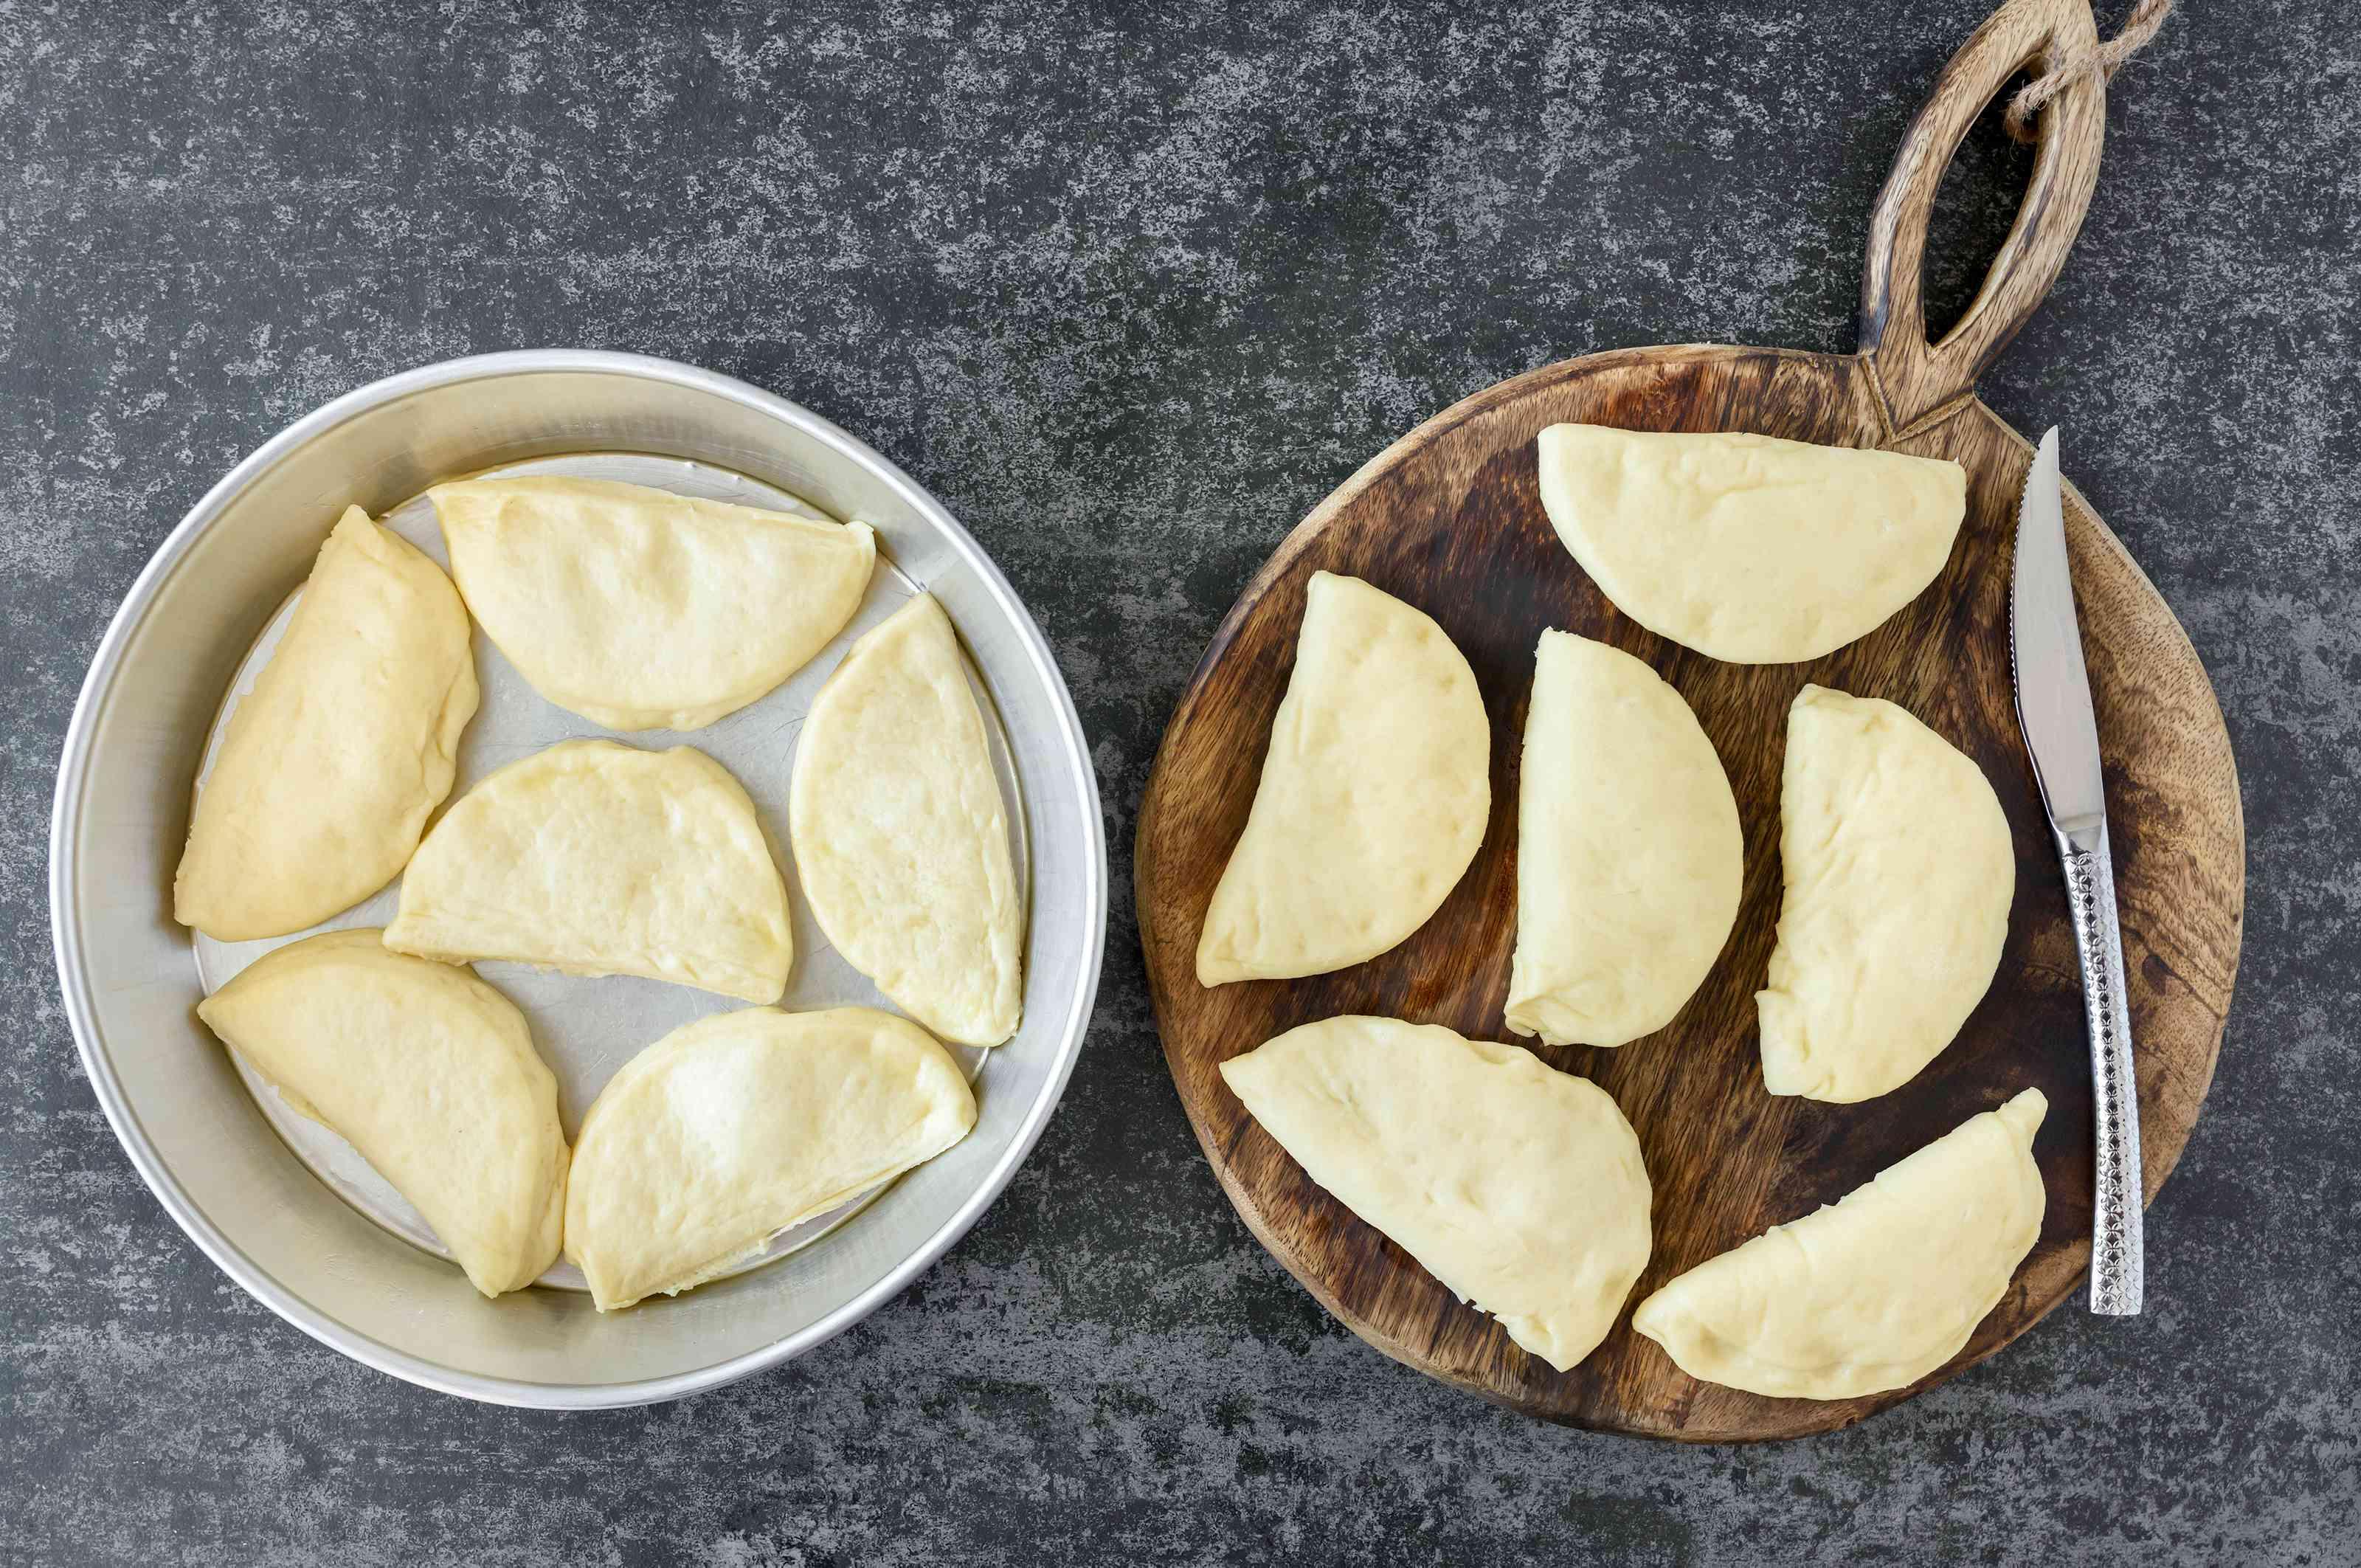 Slice yeast rolls